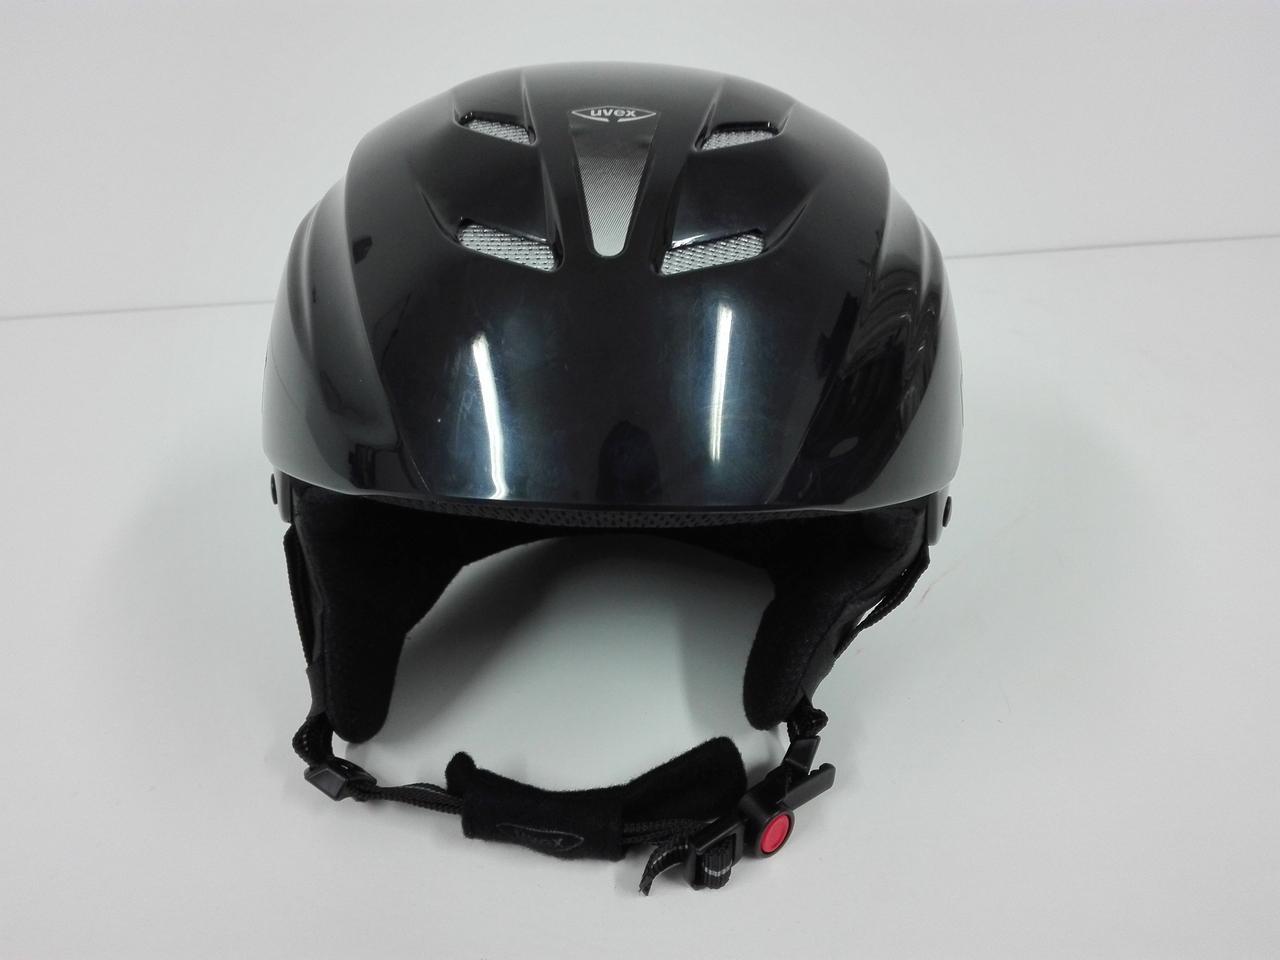 Шлемы горнолыжный UVEX skid размер - XXL